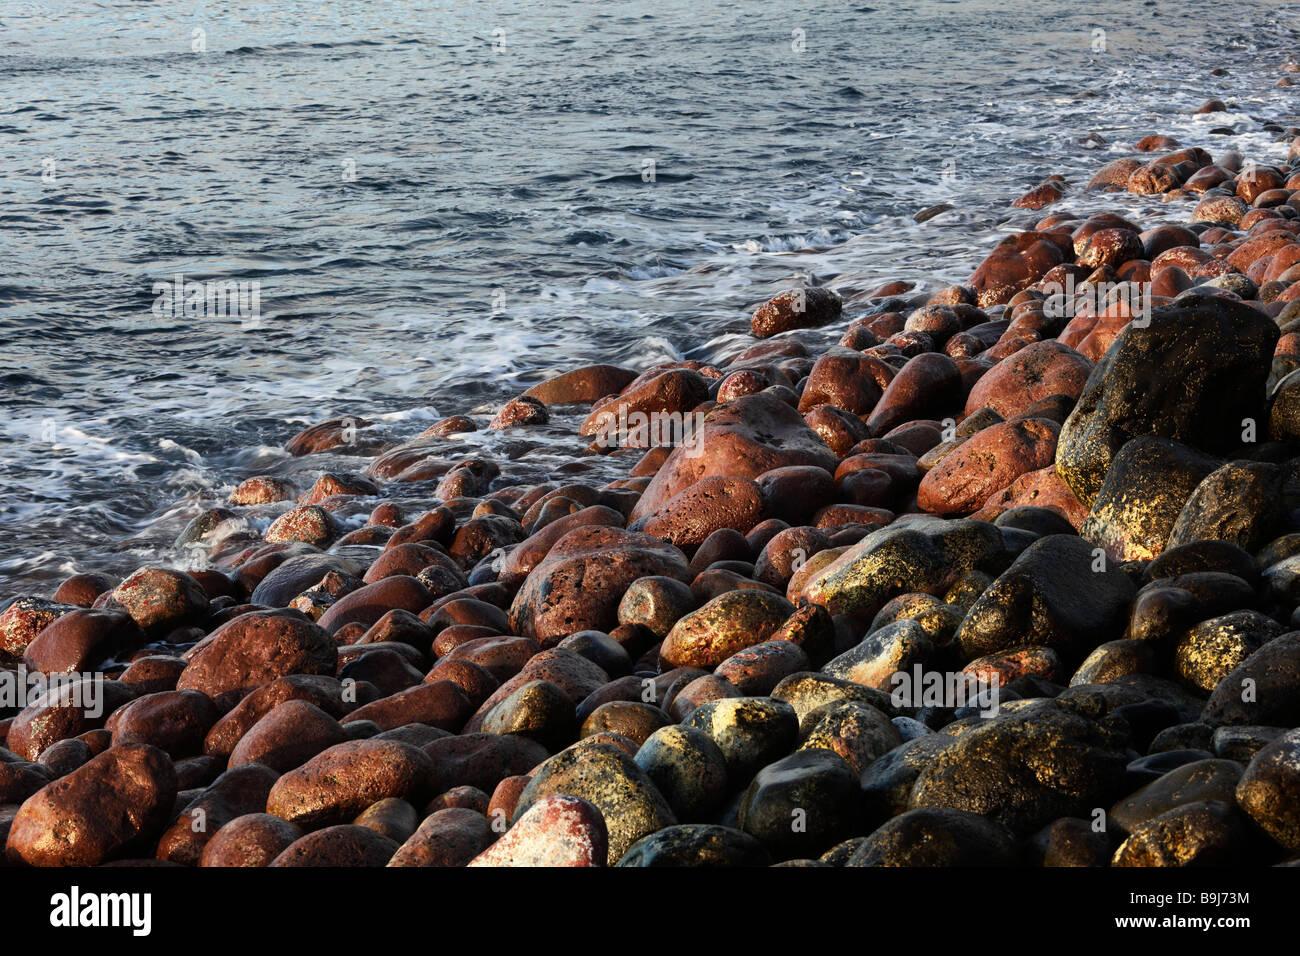 Red and black stones on a beach, Playa de Santiago, La Gomera, Canary Islands, Spain, Europe - Stock Image